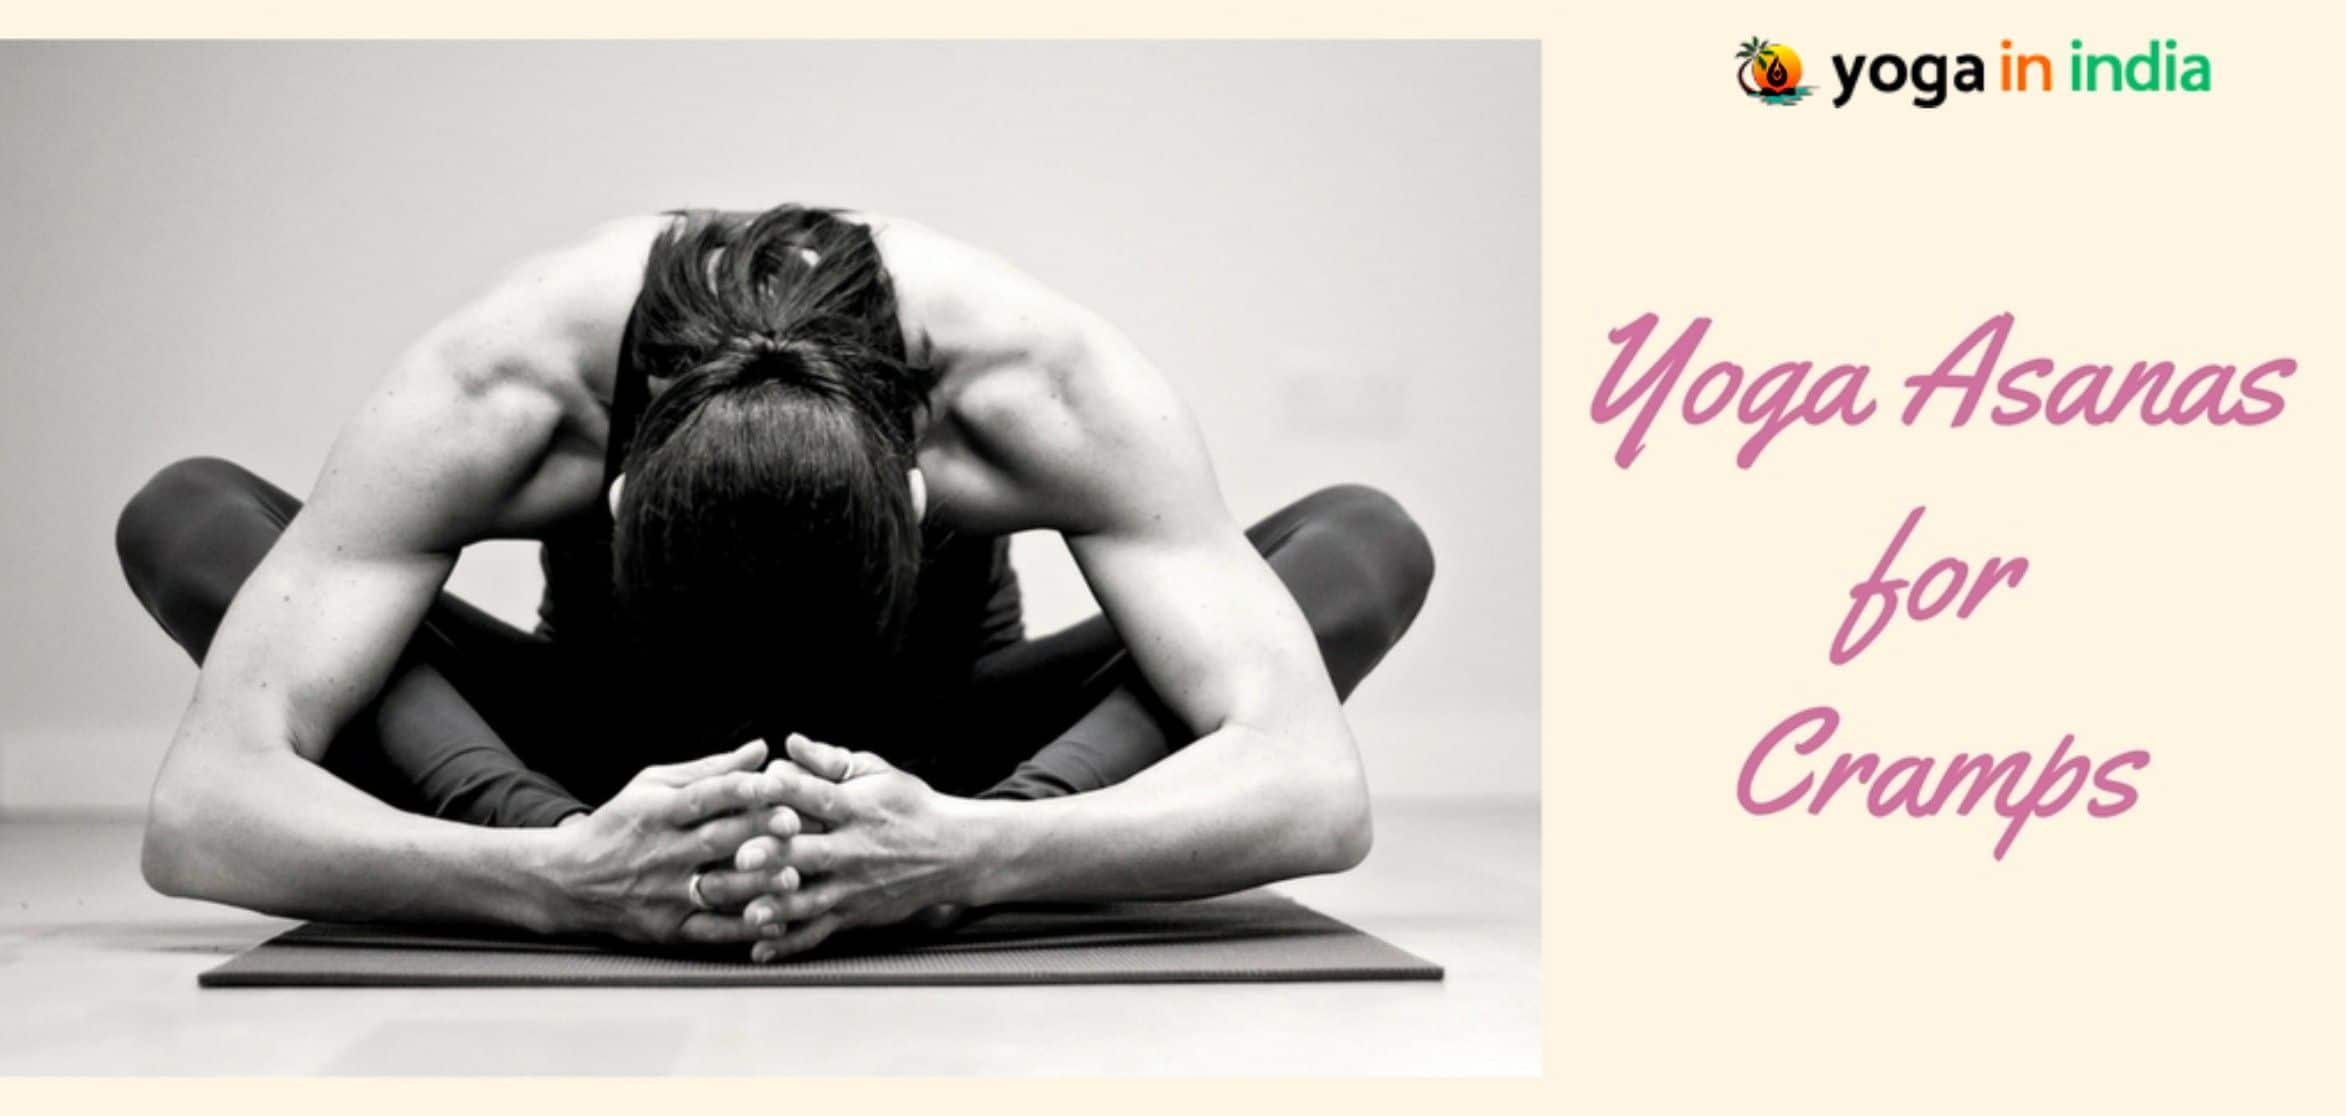 Yoga asanas for cramps